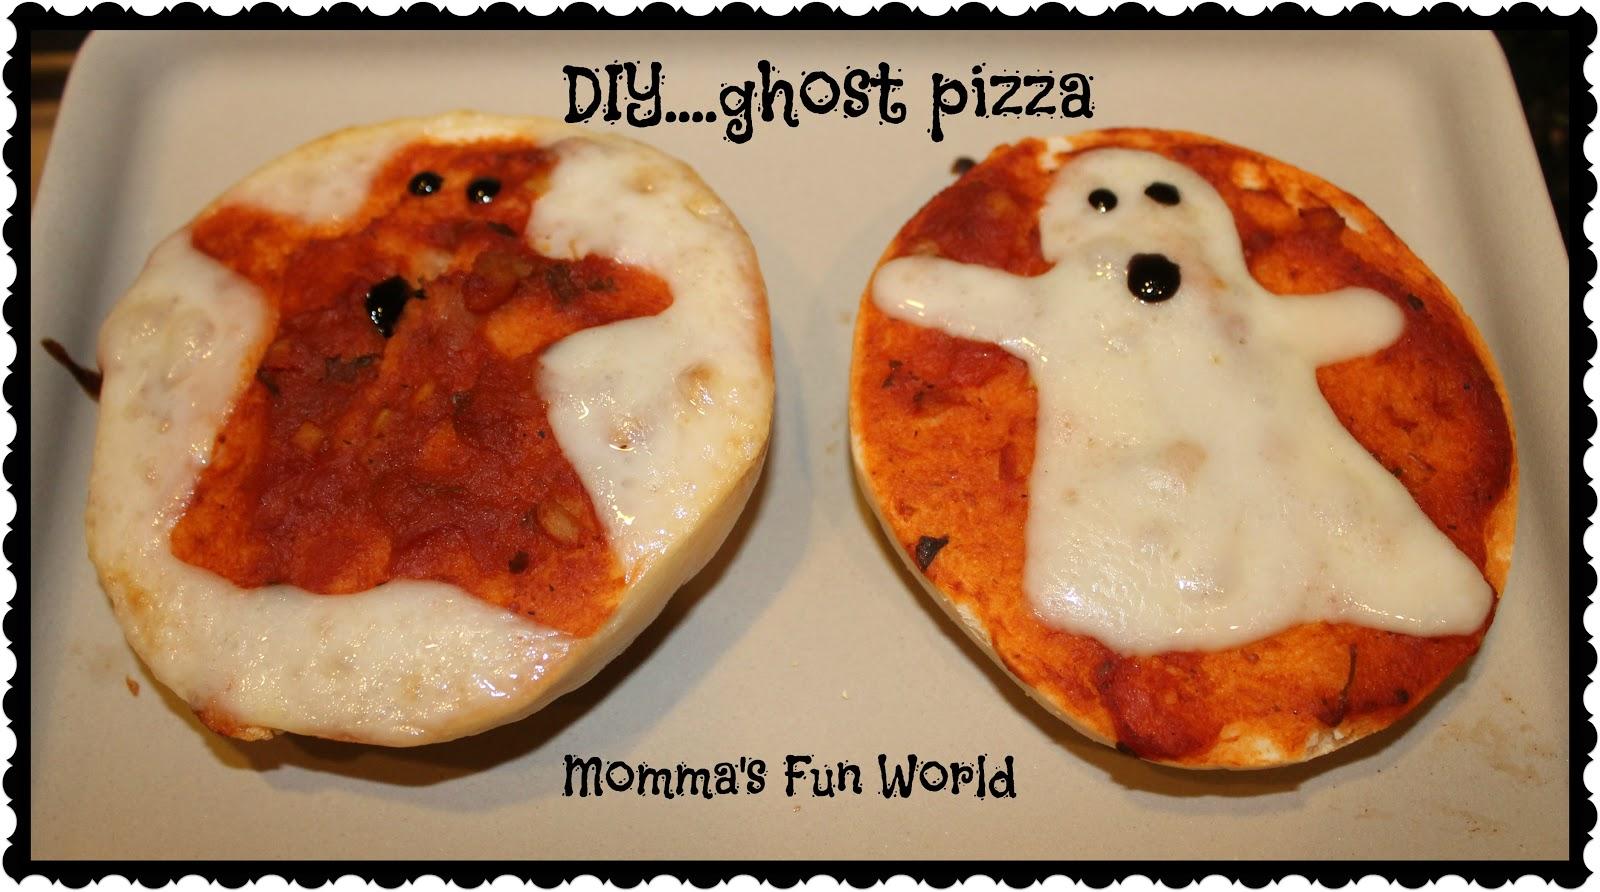 http://4.bp.blogspot.com/-Fhrkk_n8w9E/UII3SamyzUI/AAAAAAAAGEQ/xkQdprN0Dno/s1600/ghost+pizza.jpg